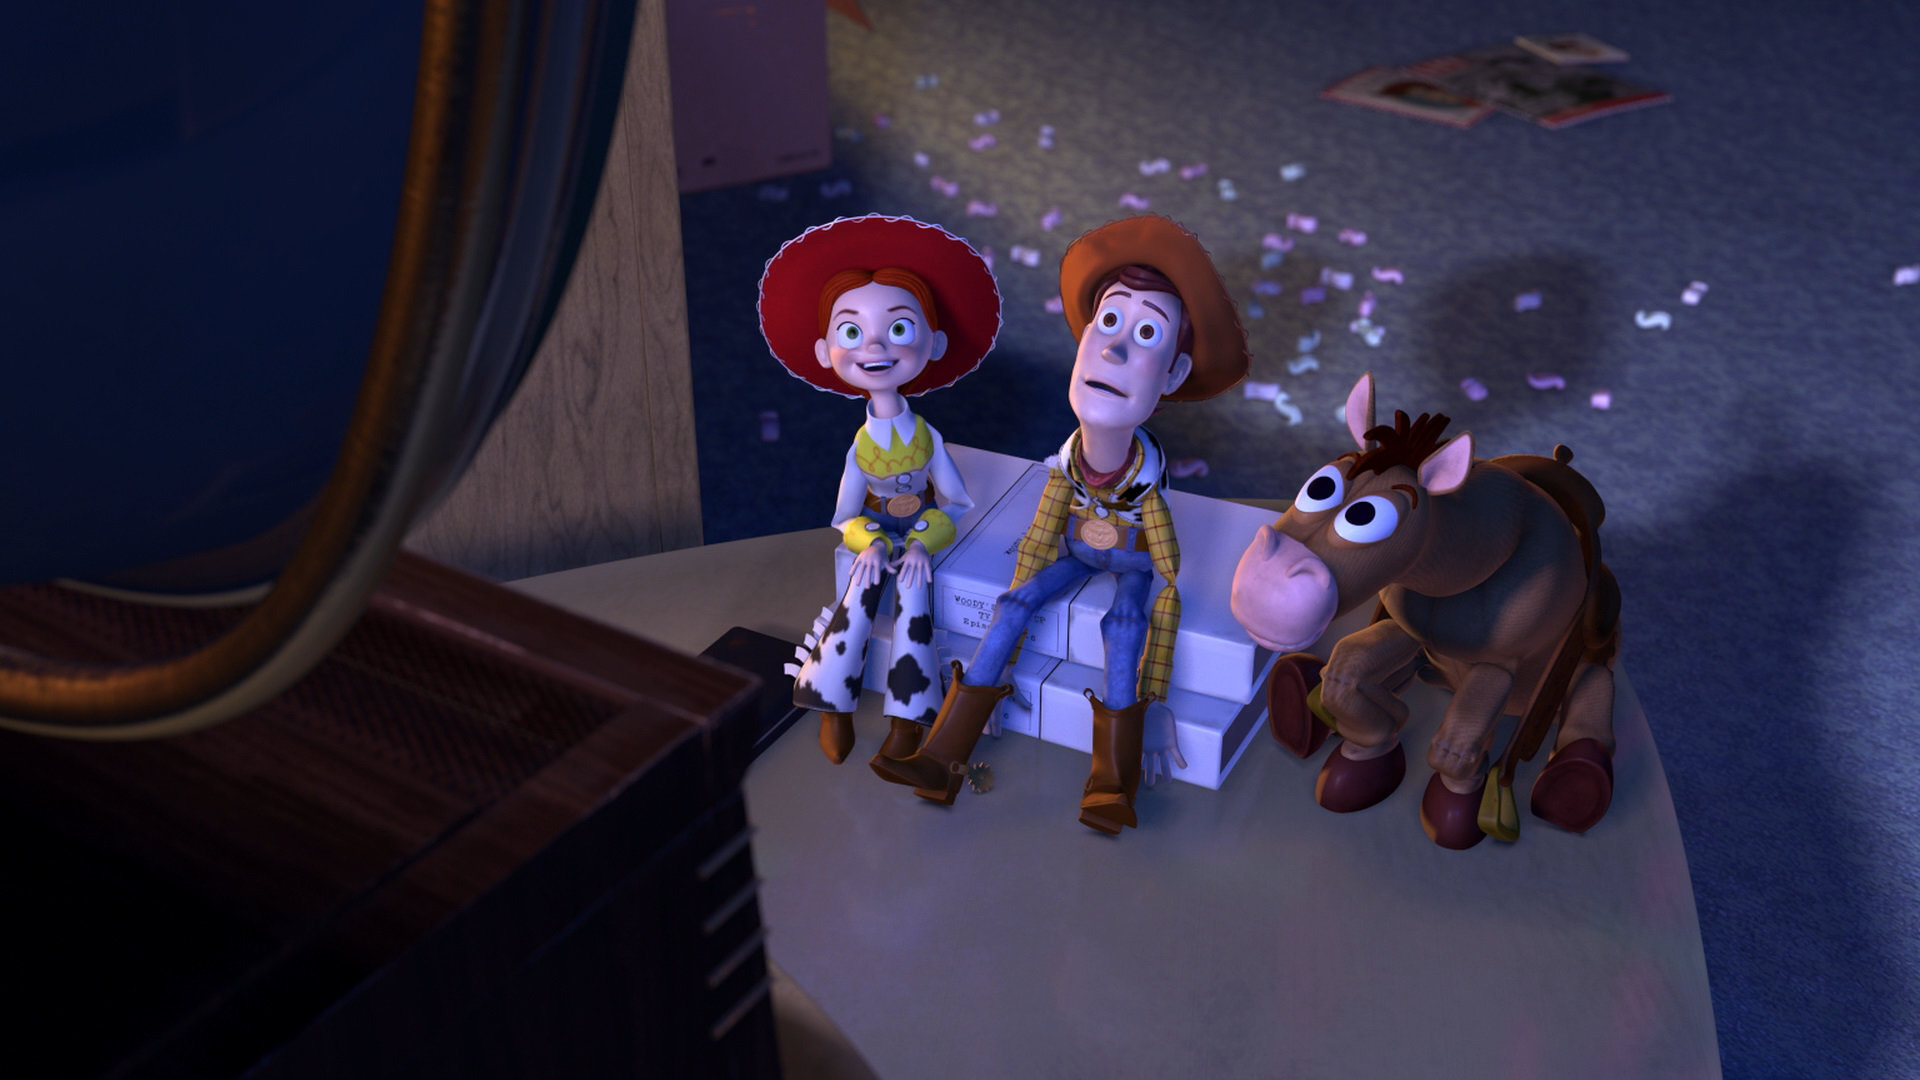 Toy Story 2 Wallpapers 1920x1080 Full Hd 1080p Desktop